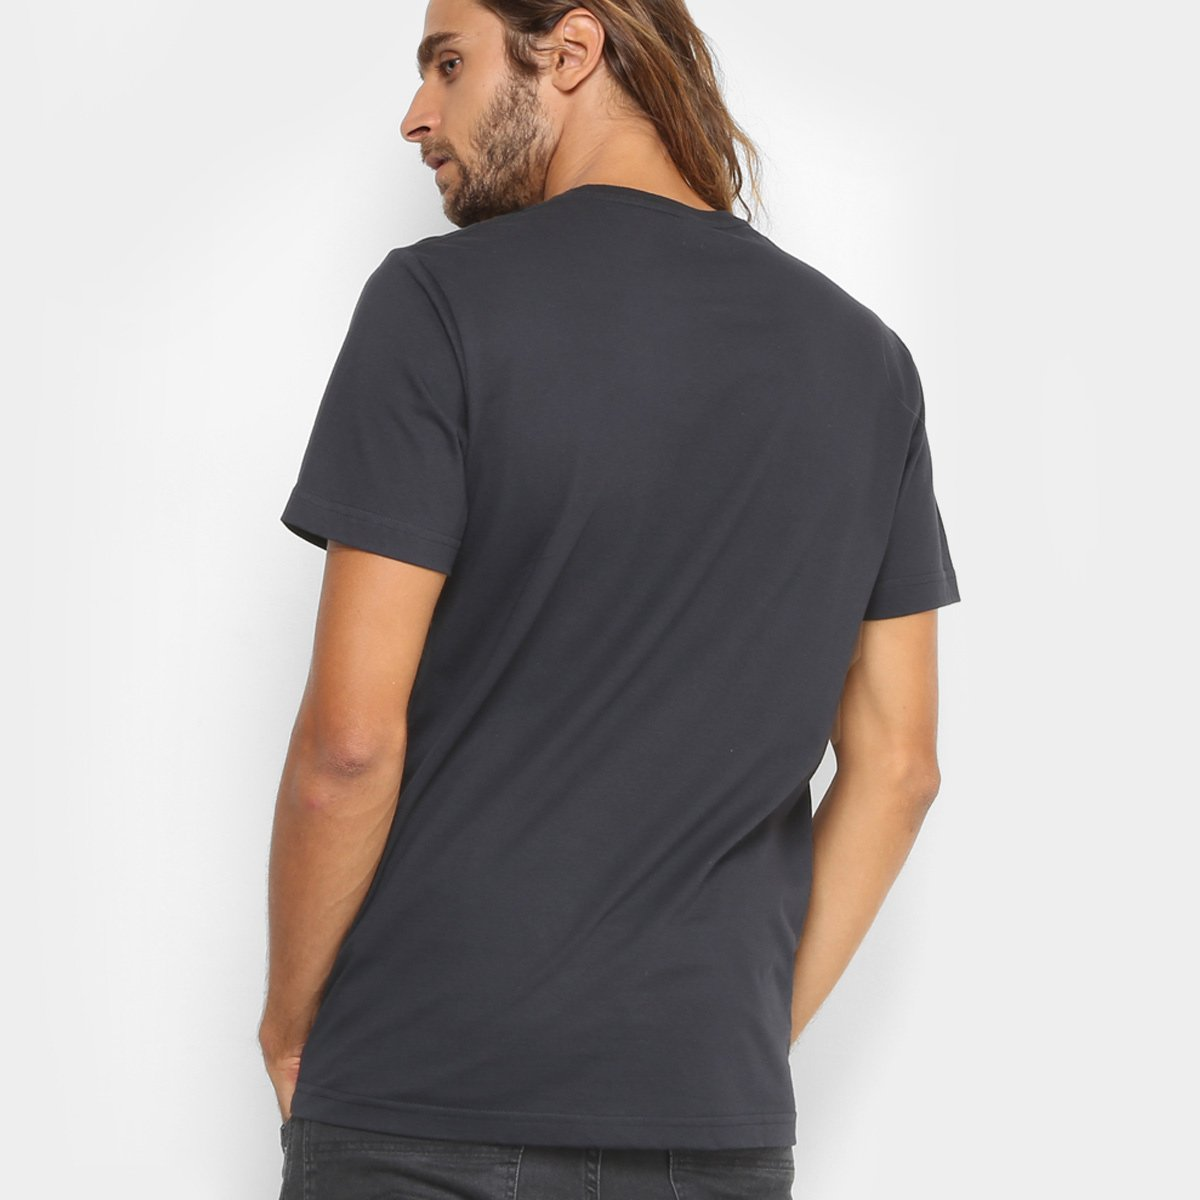 Camiseta MCD Regular Vulcano Masculina  Camiseta MCD Regular Vulcano  Masculina ... 0e8f919525a